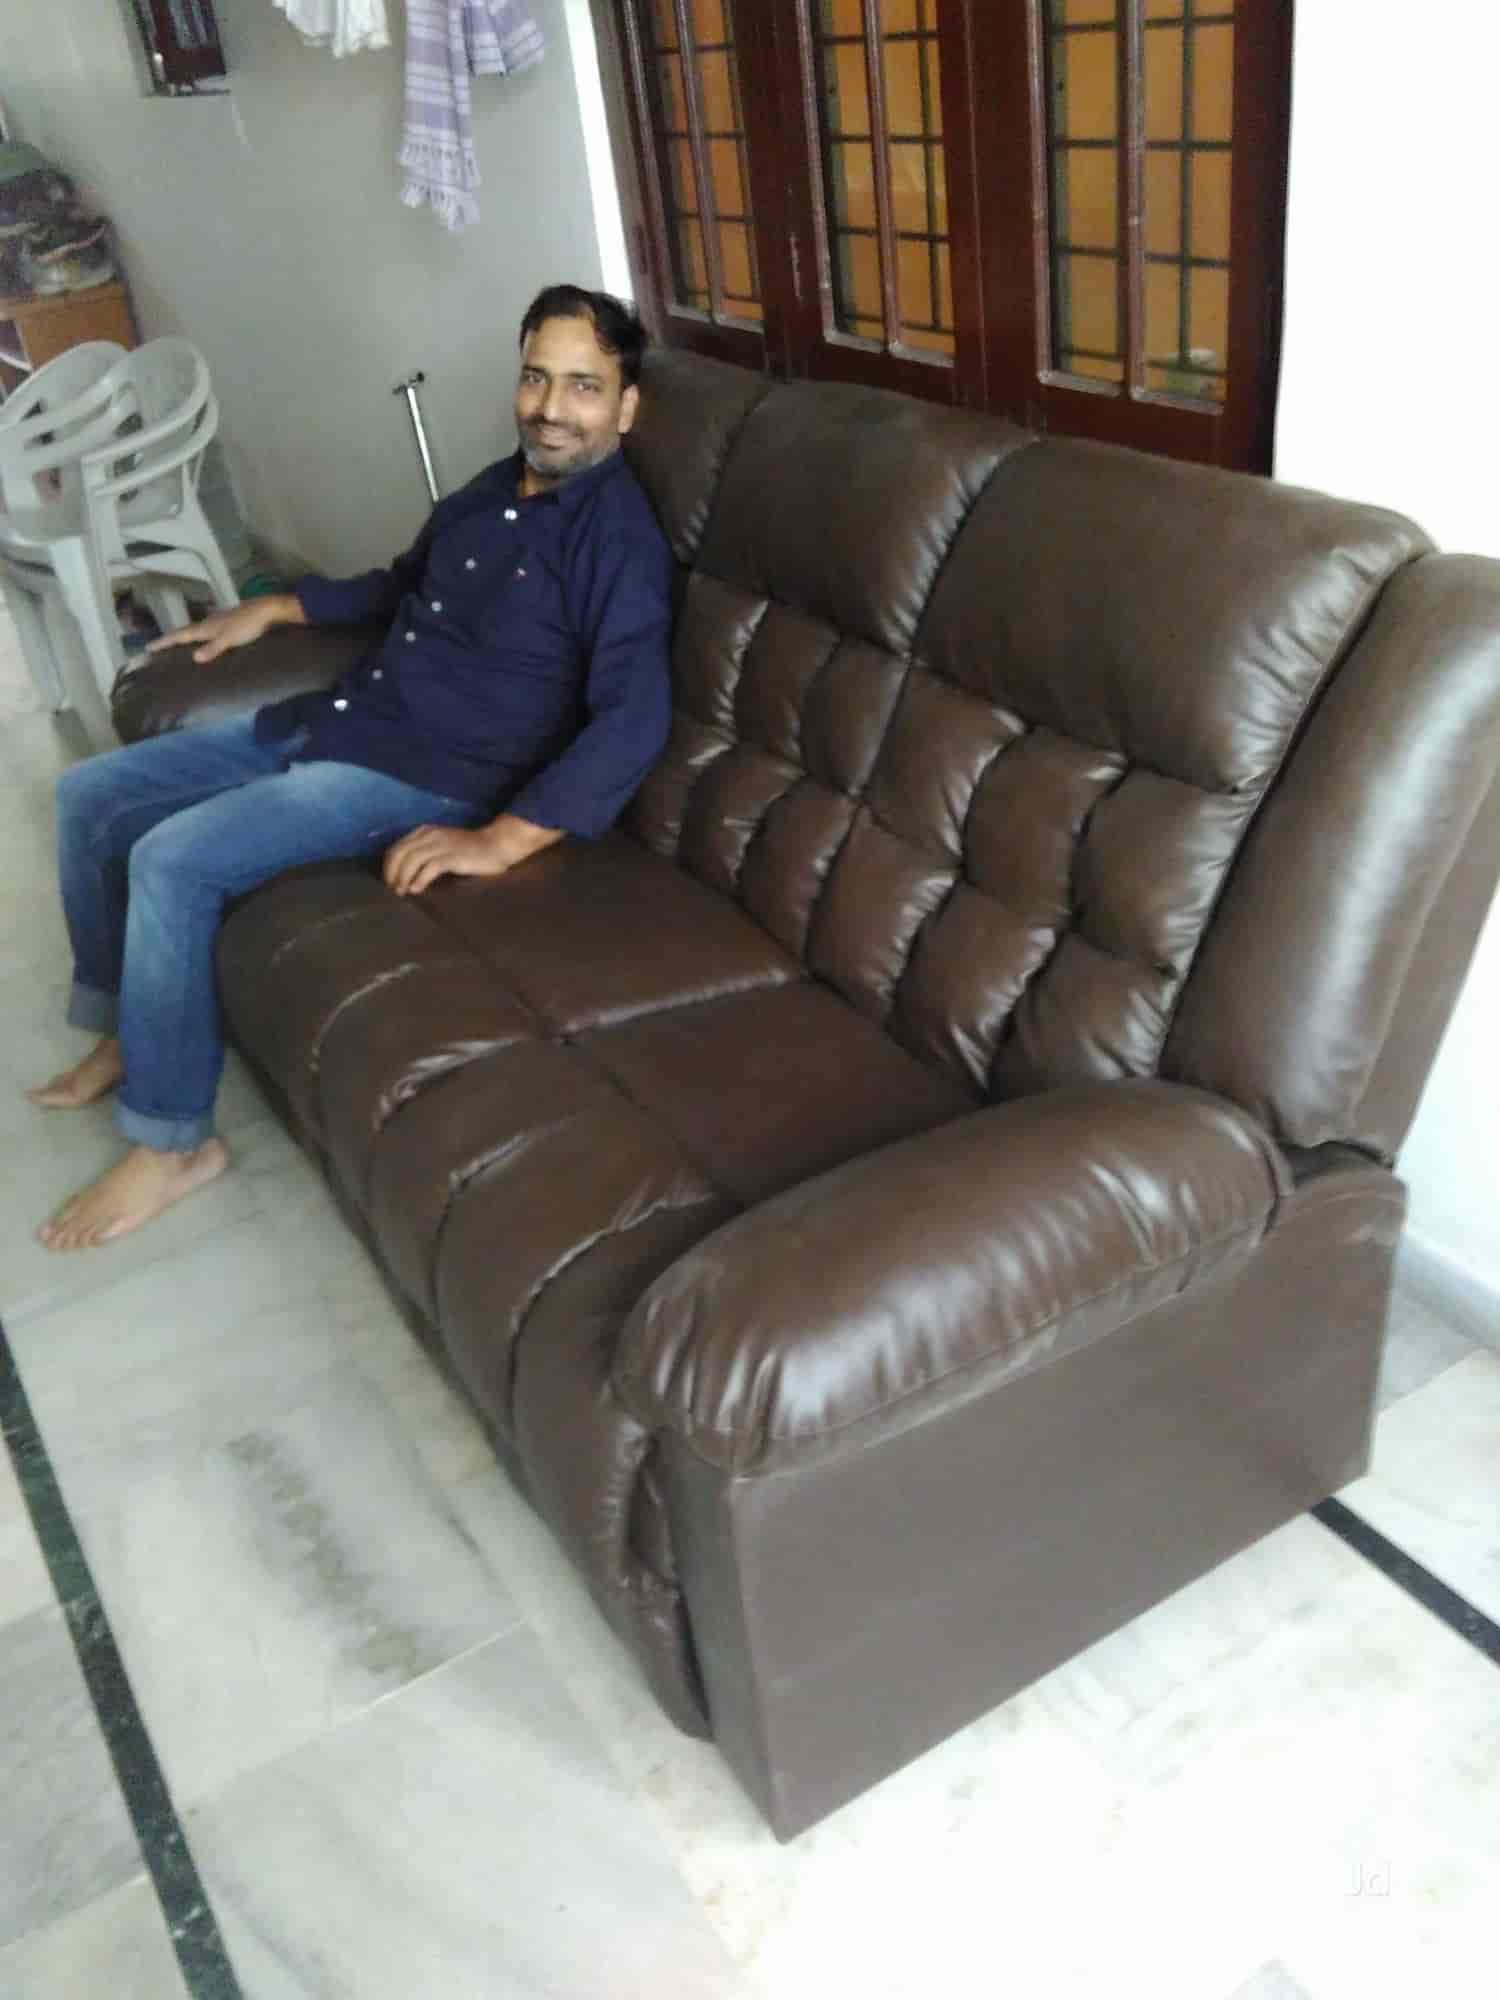 Super Star Sofa Bed Works Hs Darga Shaikpet Second Hand Furniture Ers In Hyderabad Justdial